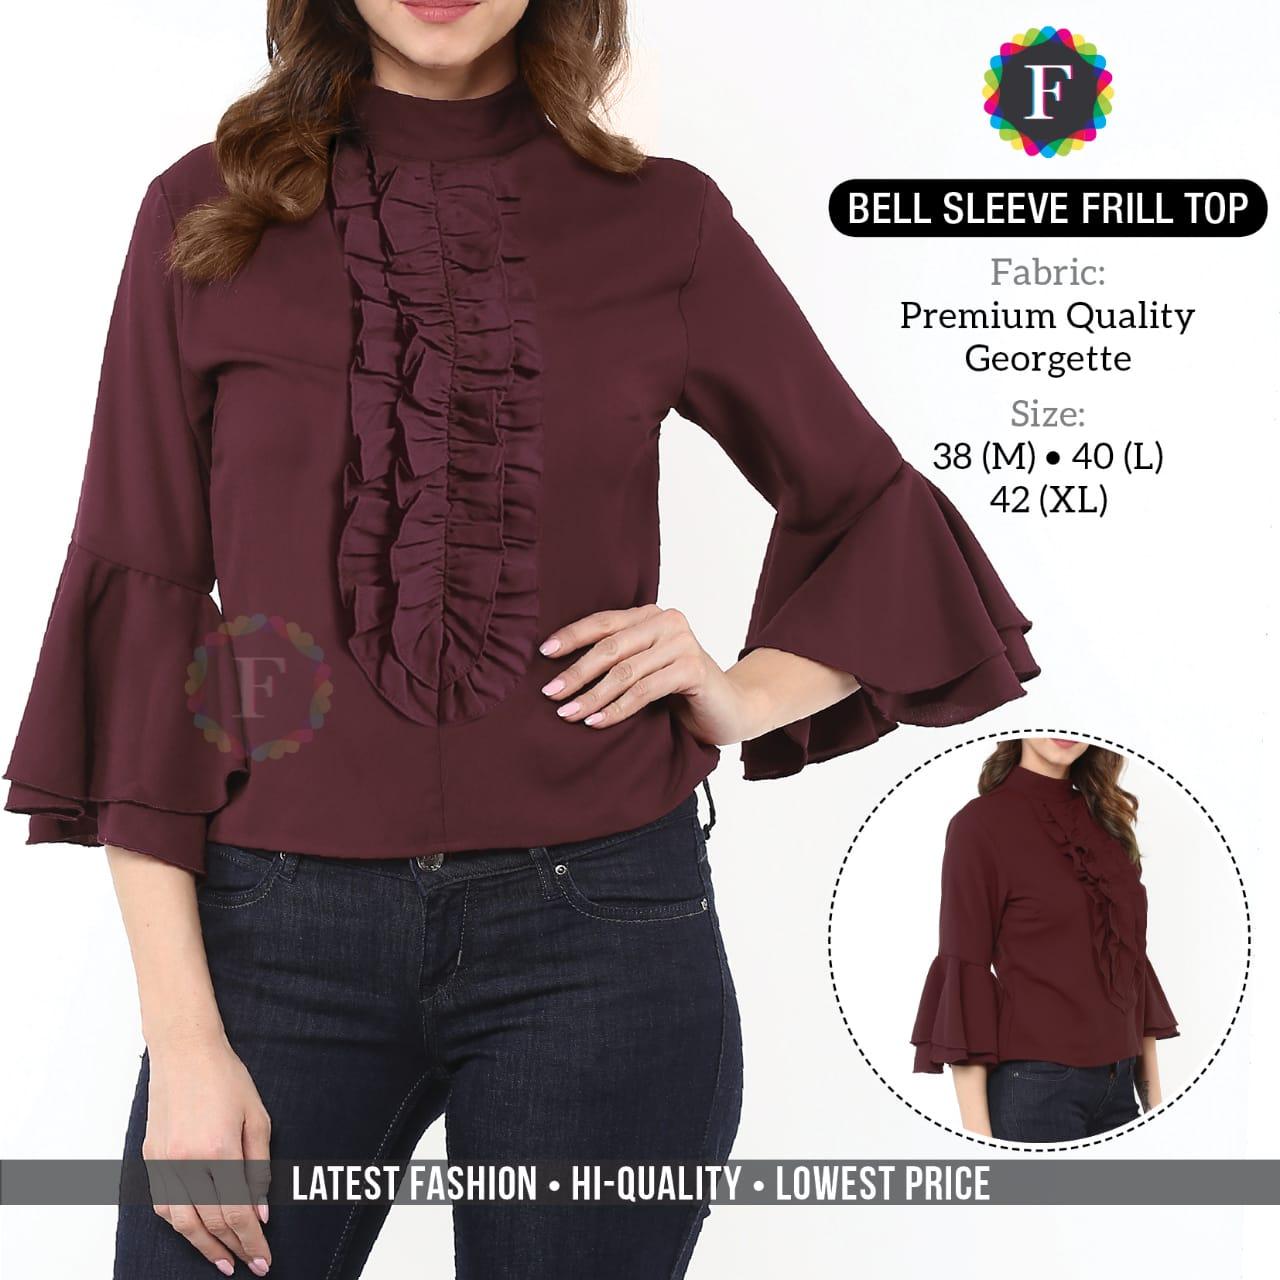 Bell Sleeve Frill Top Western Wear Girls Tops Buy Online Shopping